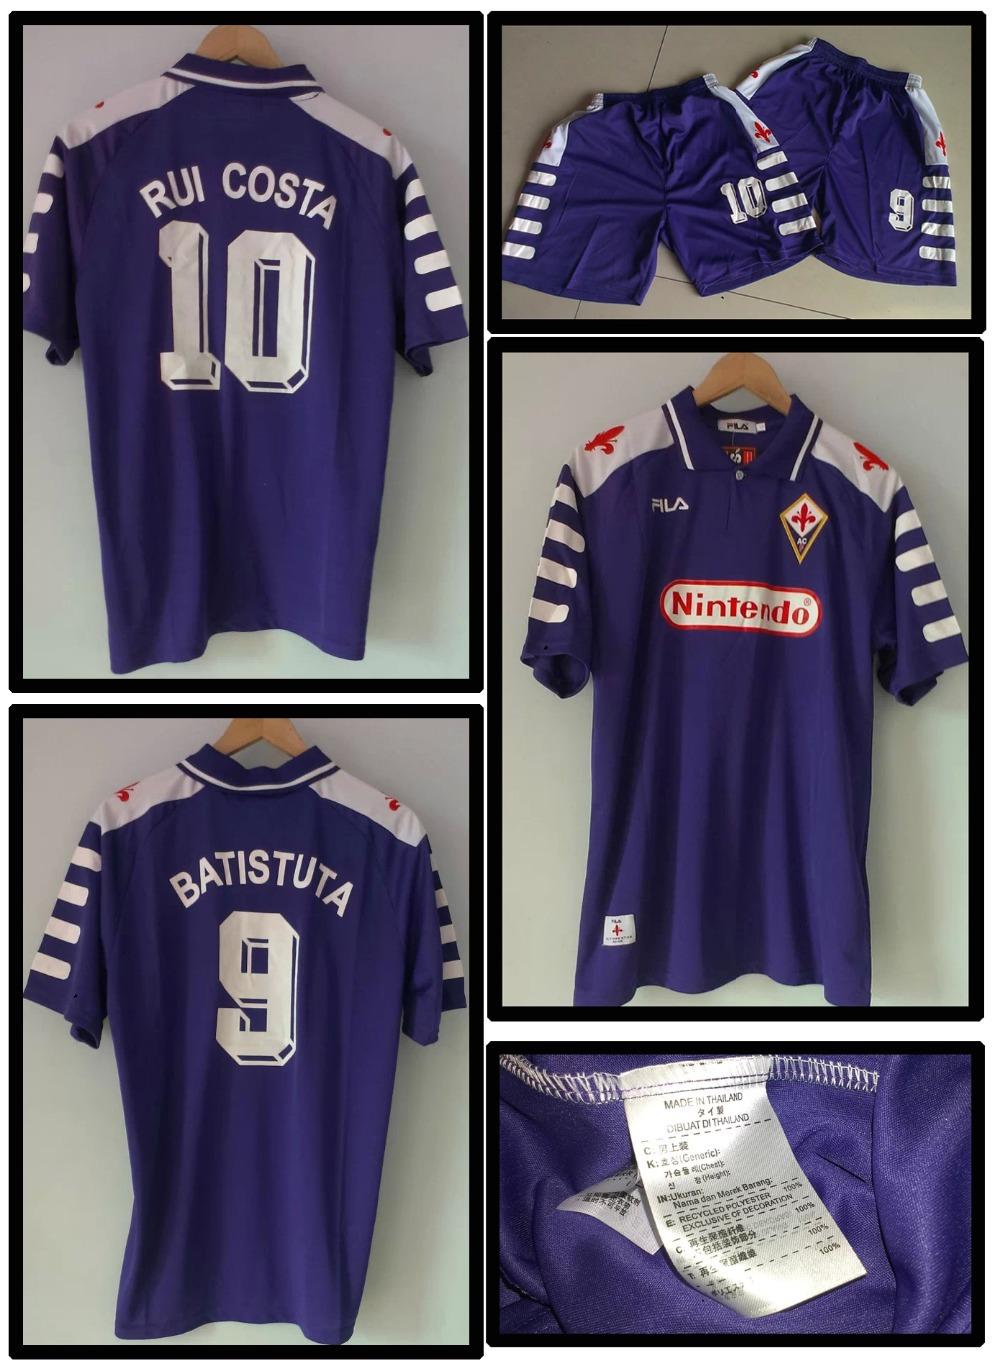 Hot ! Retro Fiorentina Jersey Batistuta/ Rui Costa 98-99 Season Football Retro Jersey Soccer Accessories(China (Mainland))